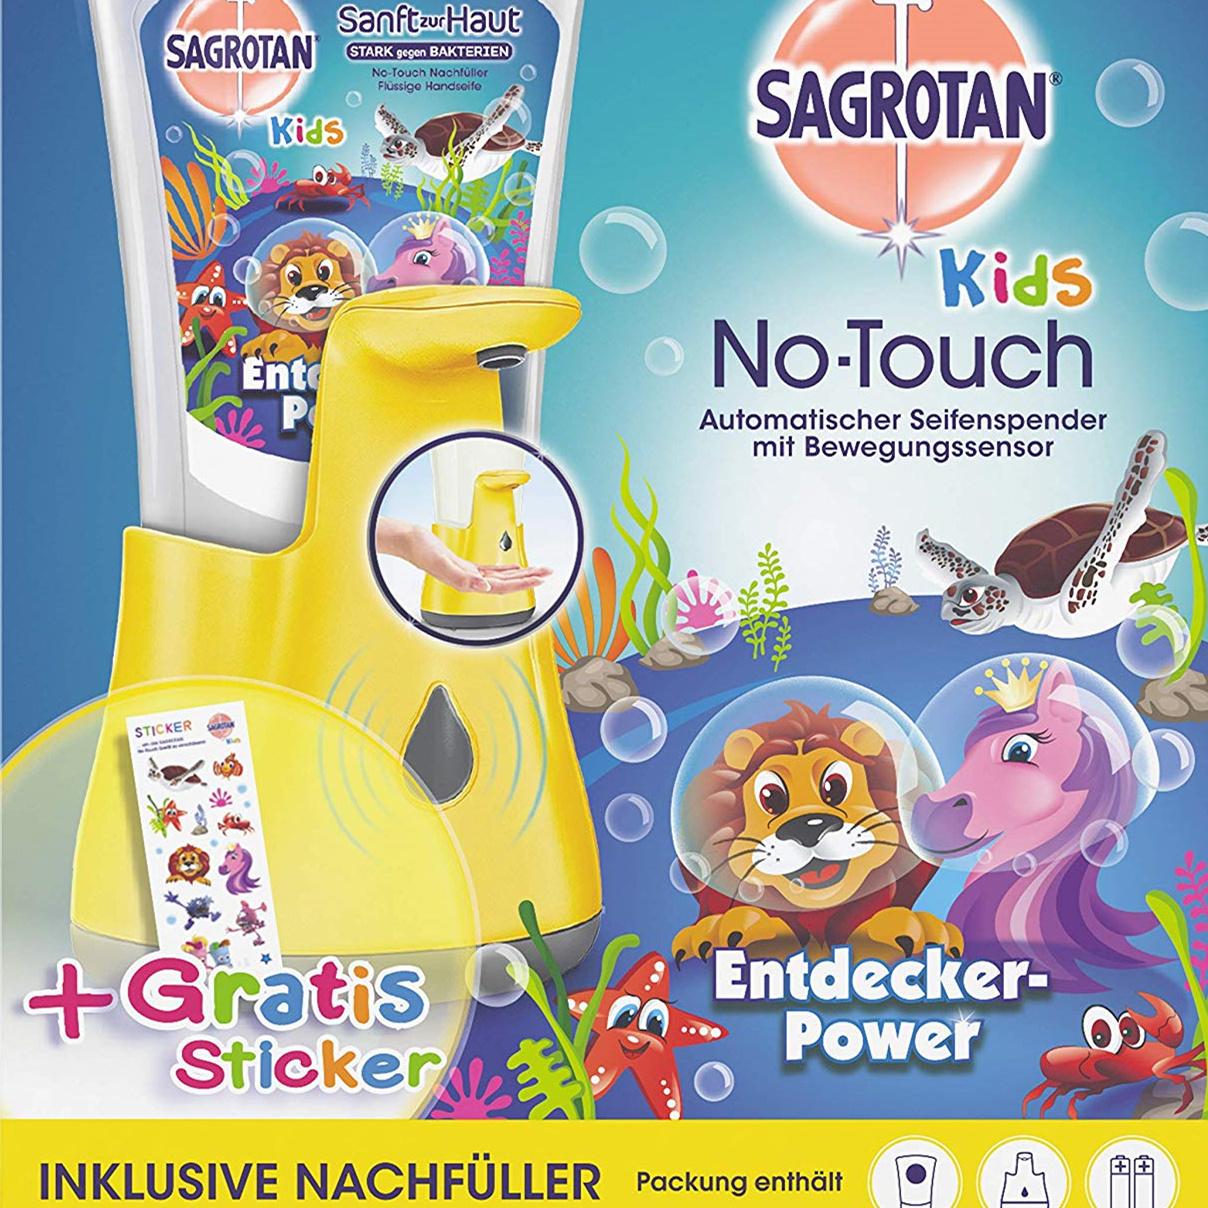 Sagrotan kids Seifenzauber 感应洗手液套装1 x 250ml